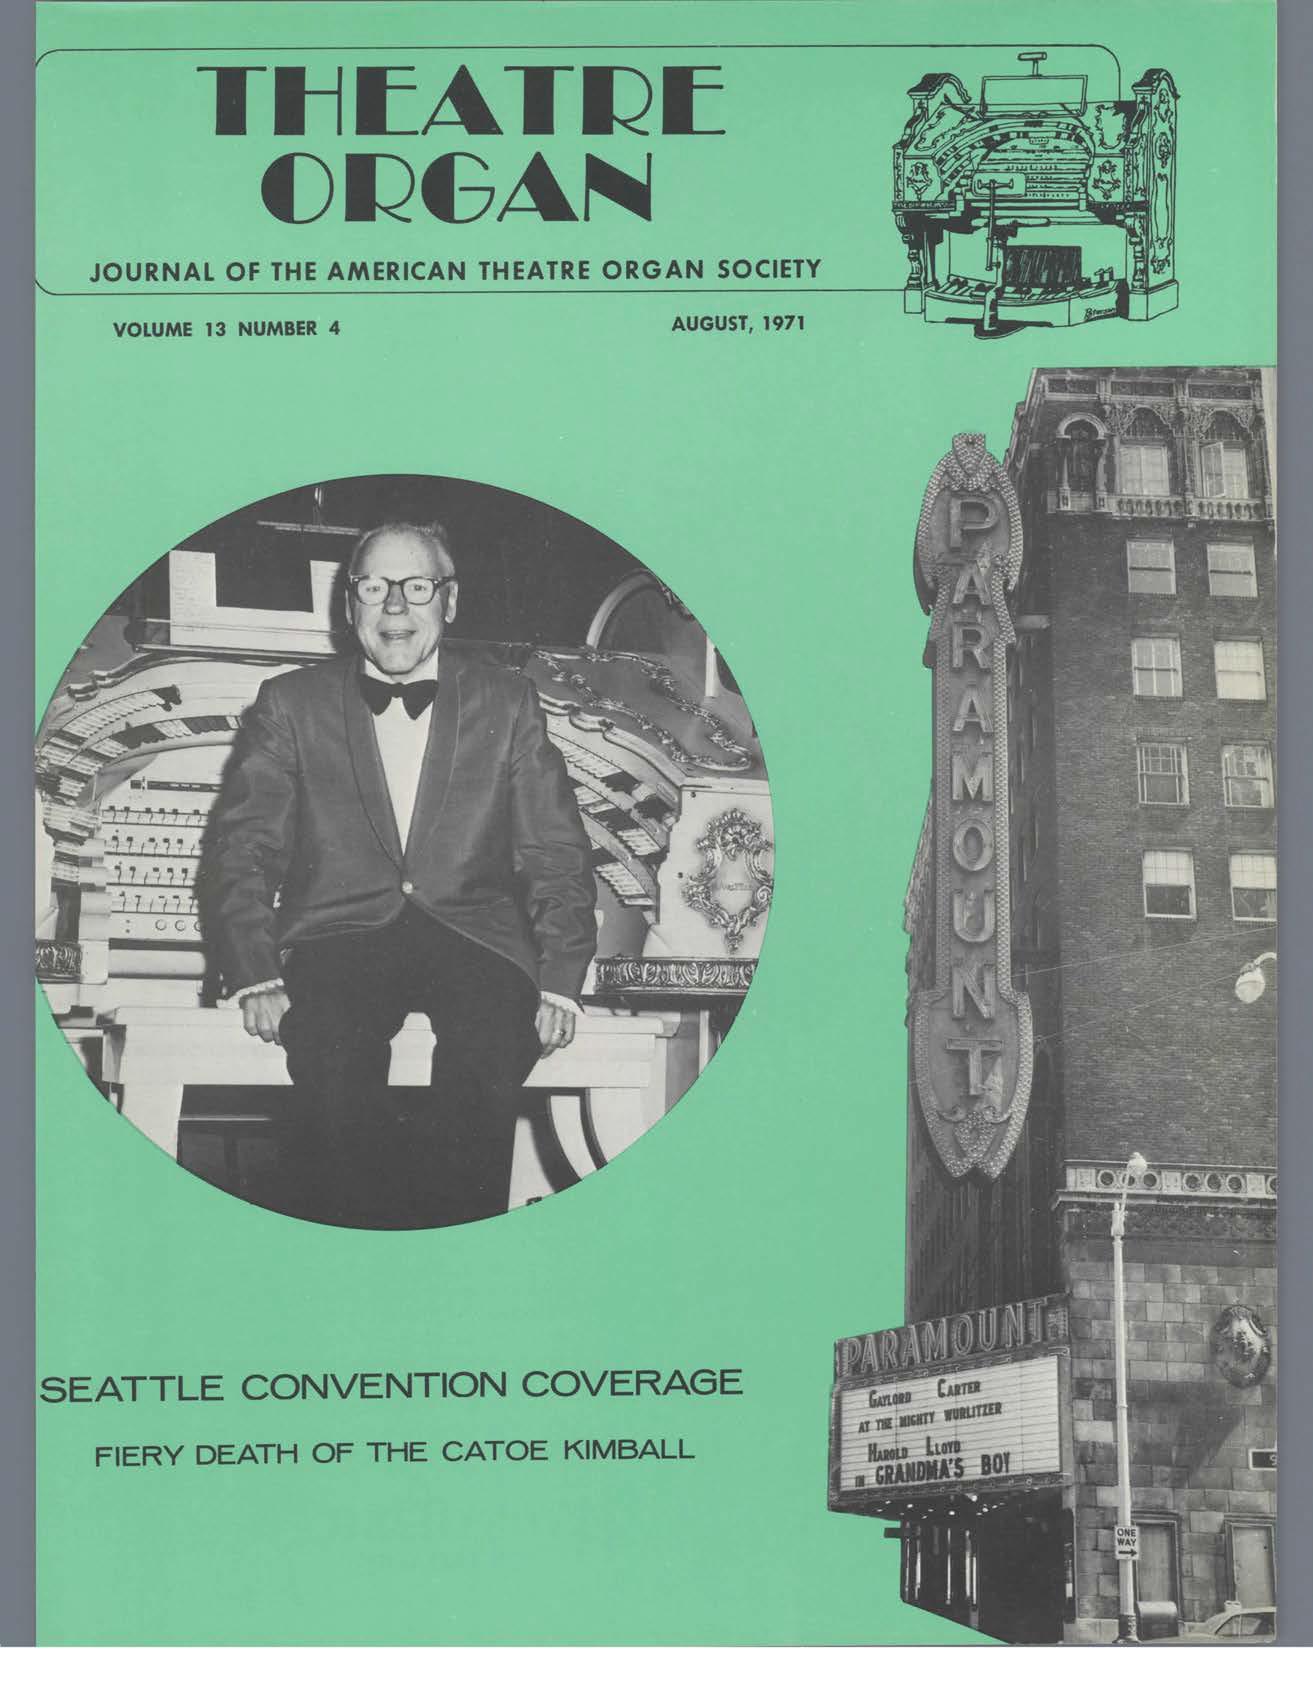 Theatre Organ, August 1971, Volume 13, Number 4